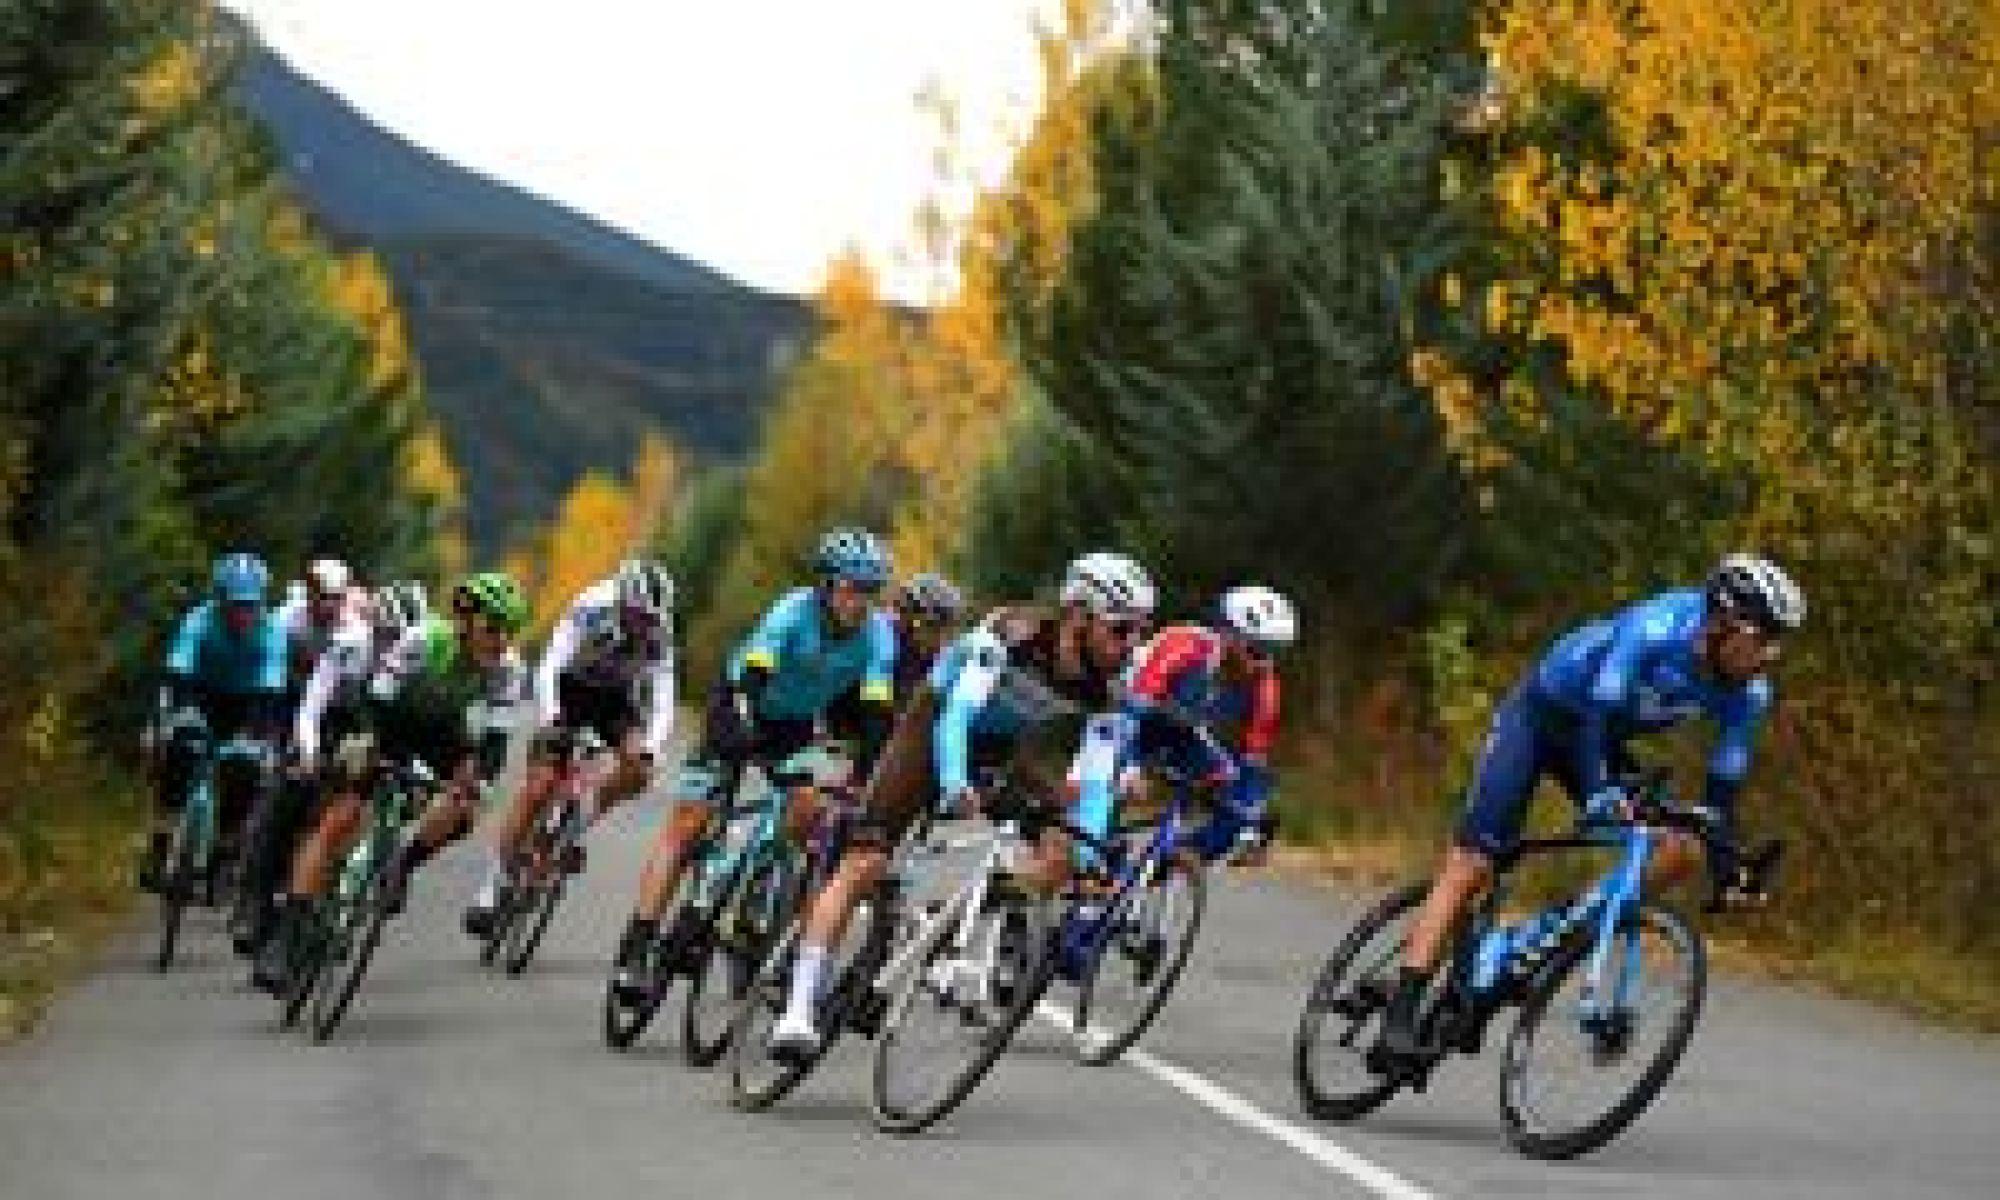 No coronavirus positives at Vuelta a España after rest day